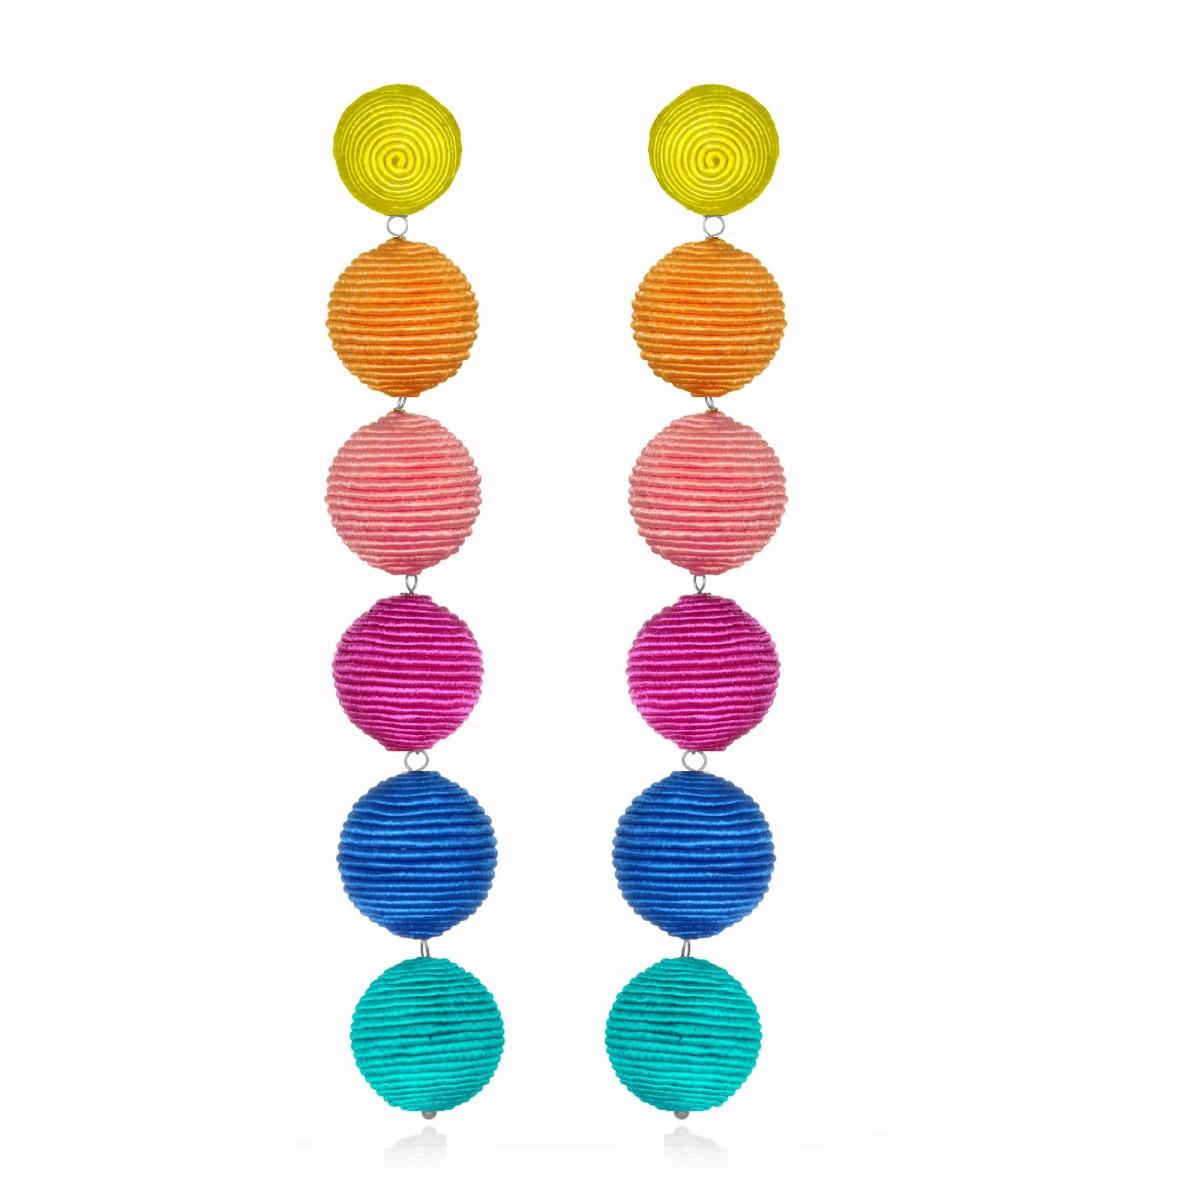 Rainbow Gumball Earrings by SUZANNA DAI